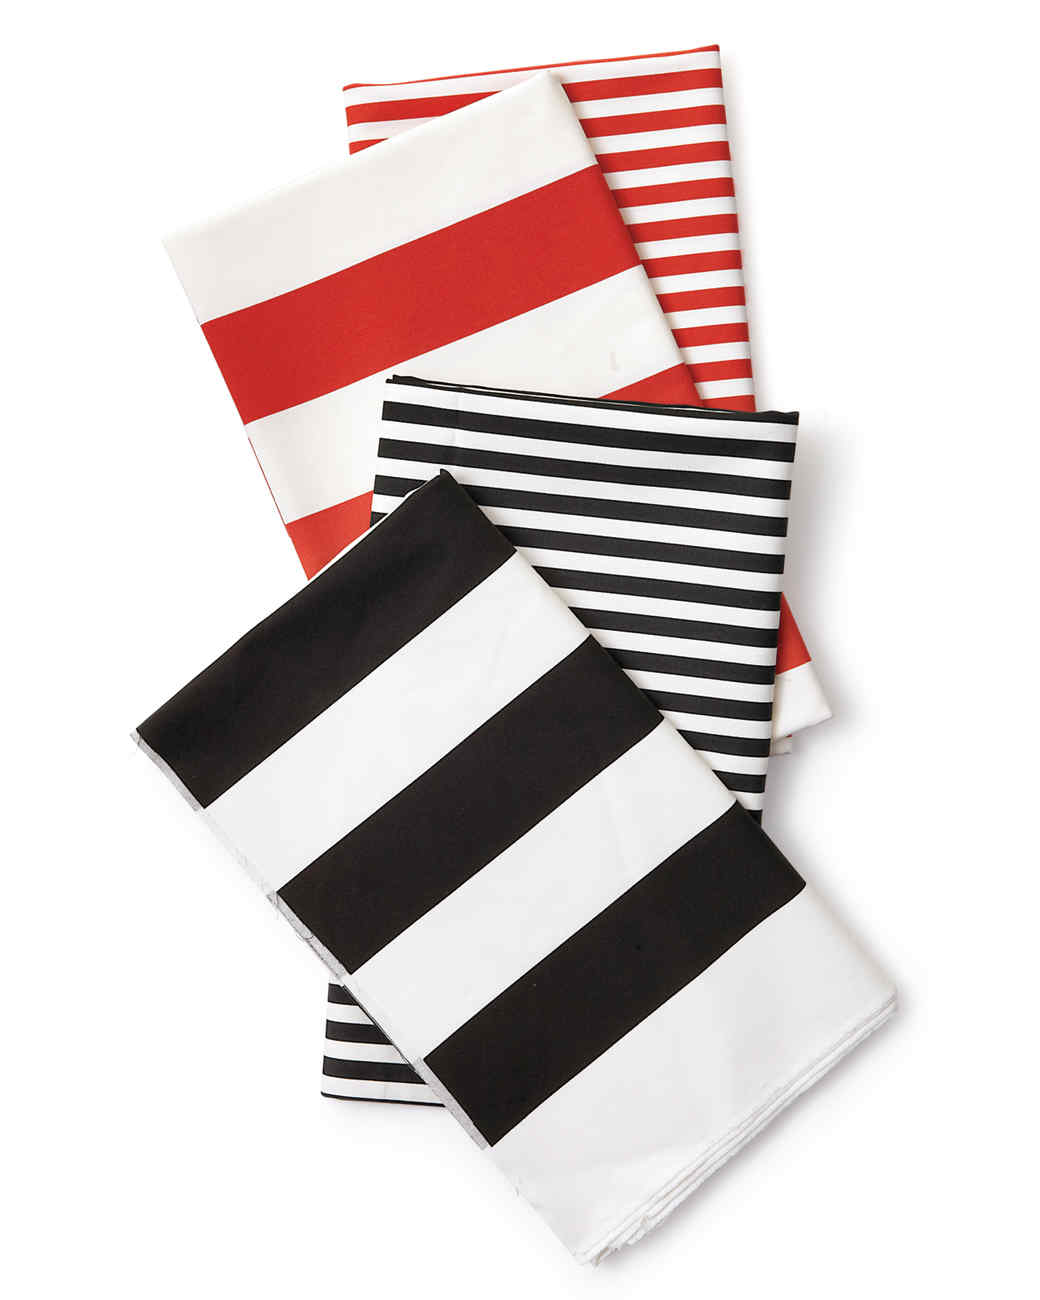 fabric-007-mld109144.jpg